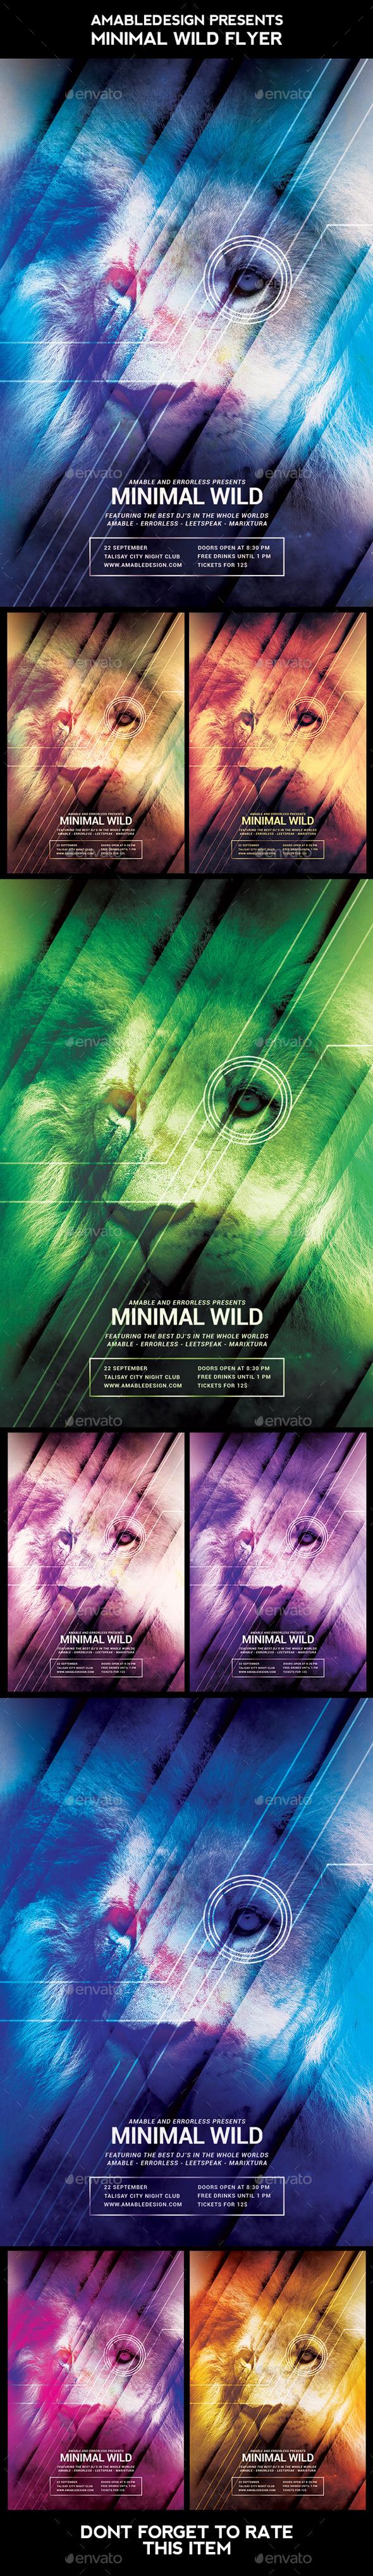 Minimal Wild Flyer - Clubs & Parties Events